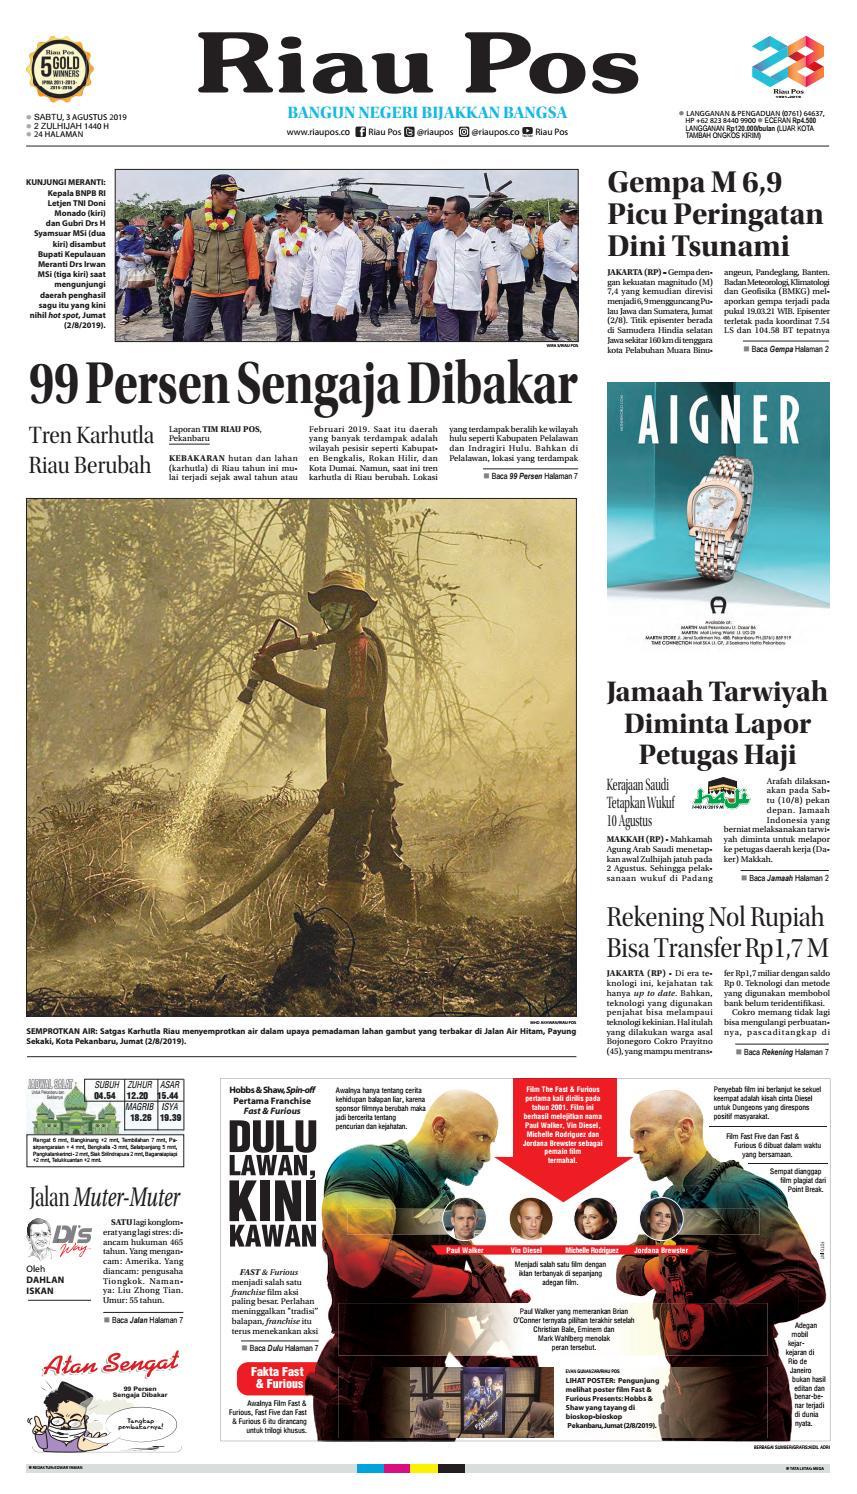 Riau Pos Edisi Sabtu 03 Agustus 2019 By Riau Pos Issuu